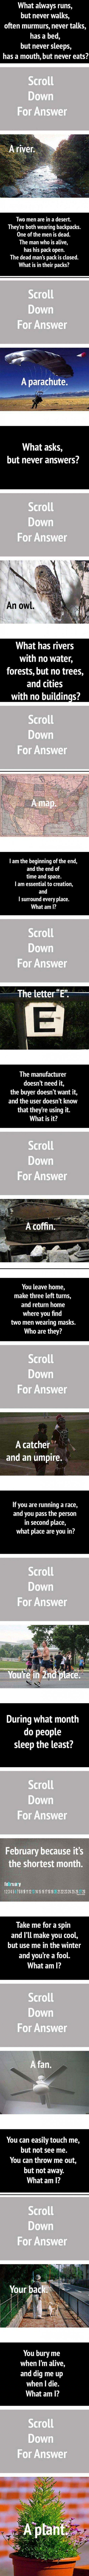 Bilbo Baggins riddles